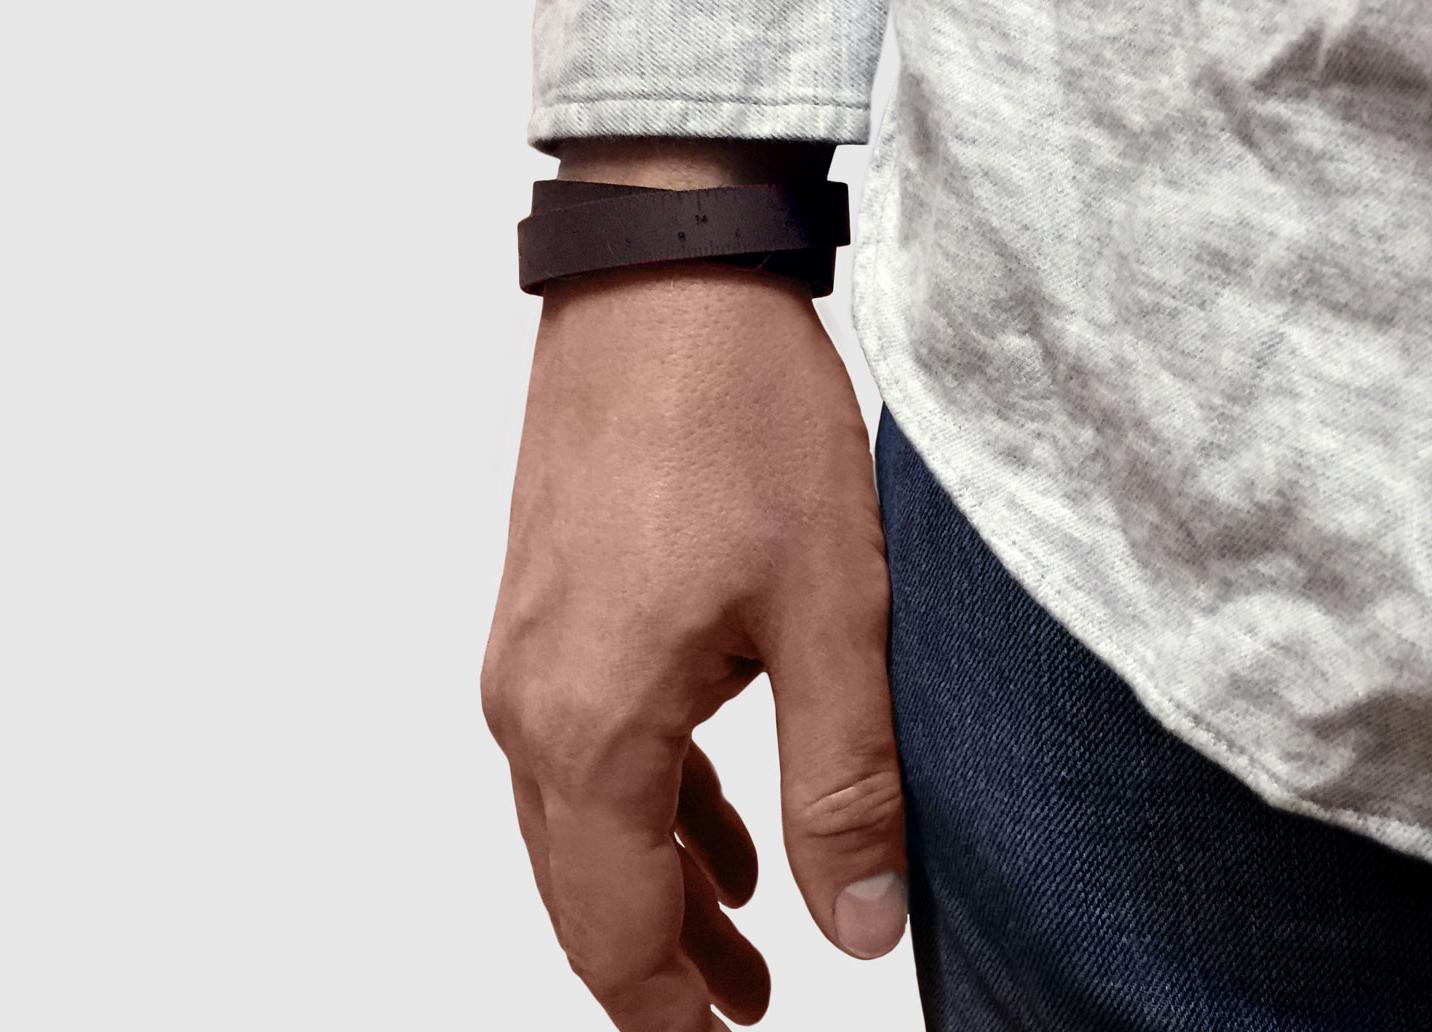 wrist-ruler-leather-wristband4.jpg